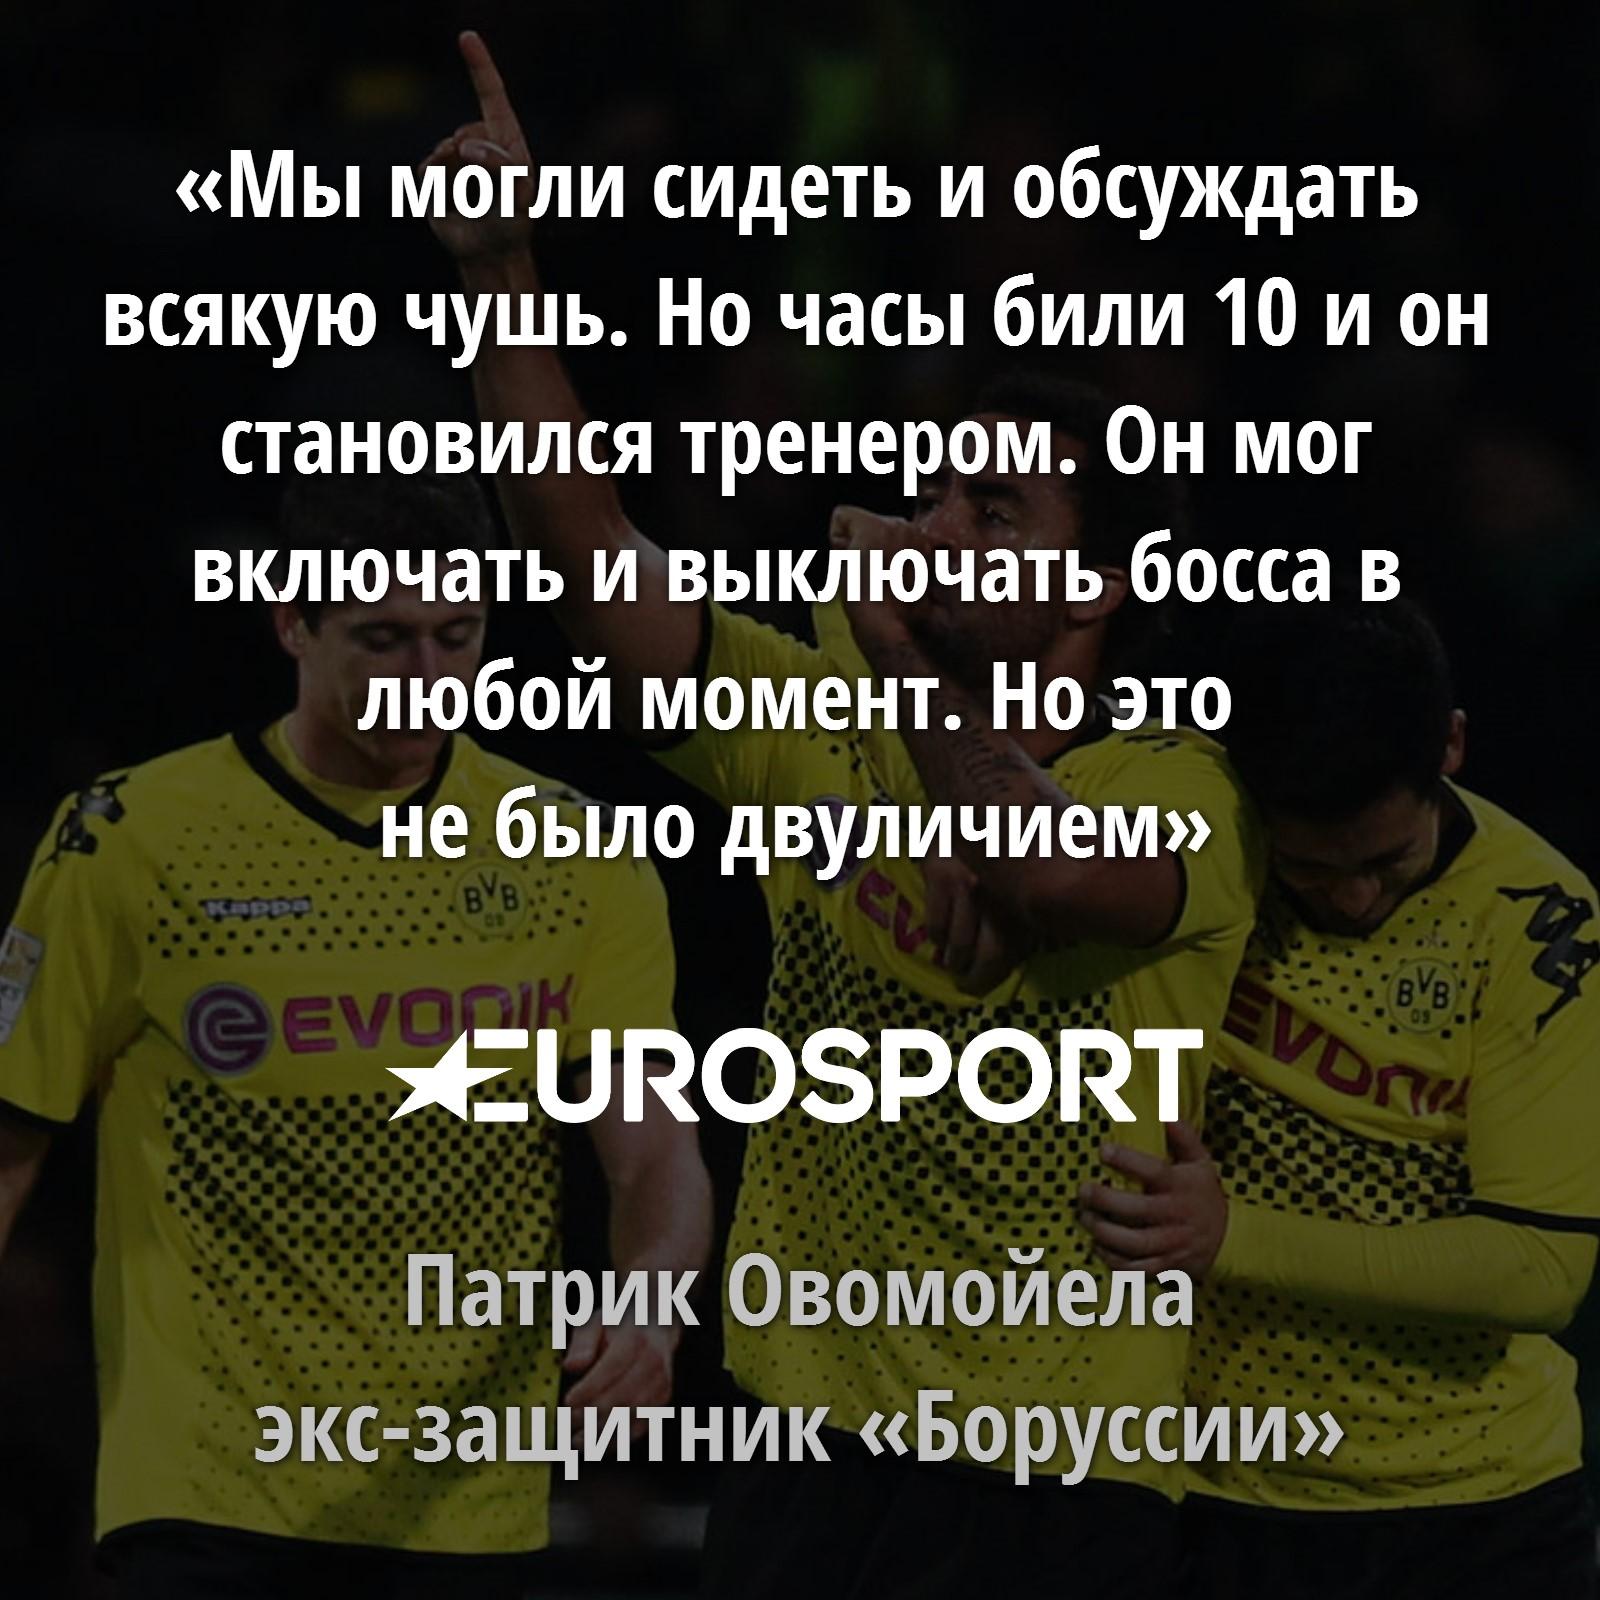 https://i.eurosport.com/2015/11/19/1735218.jpg